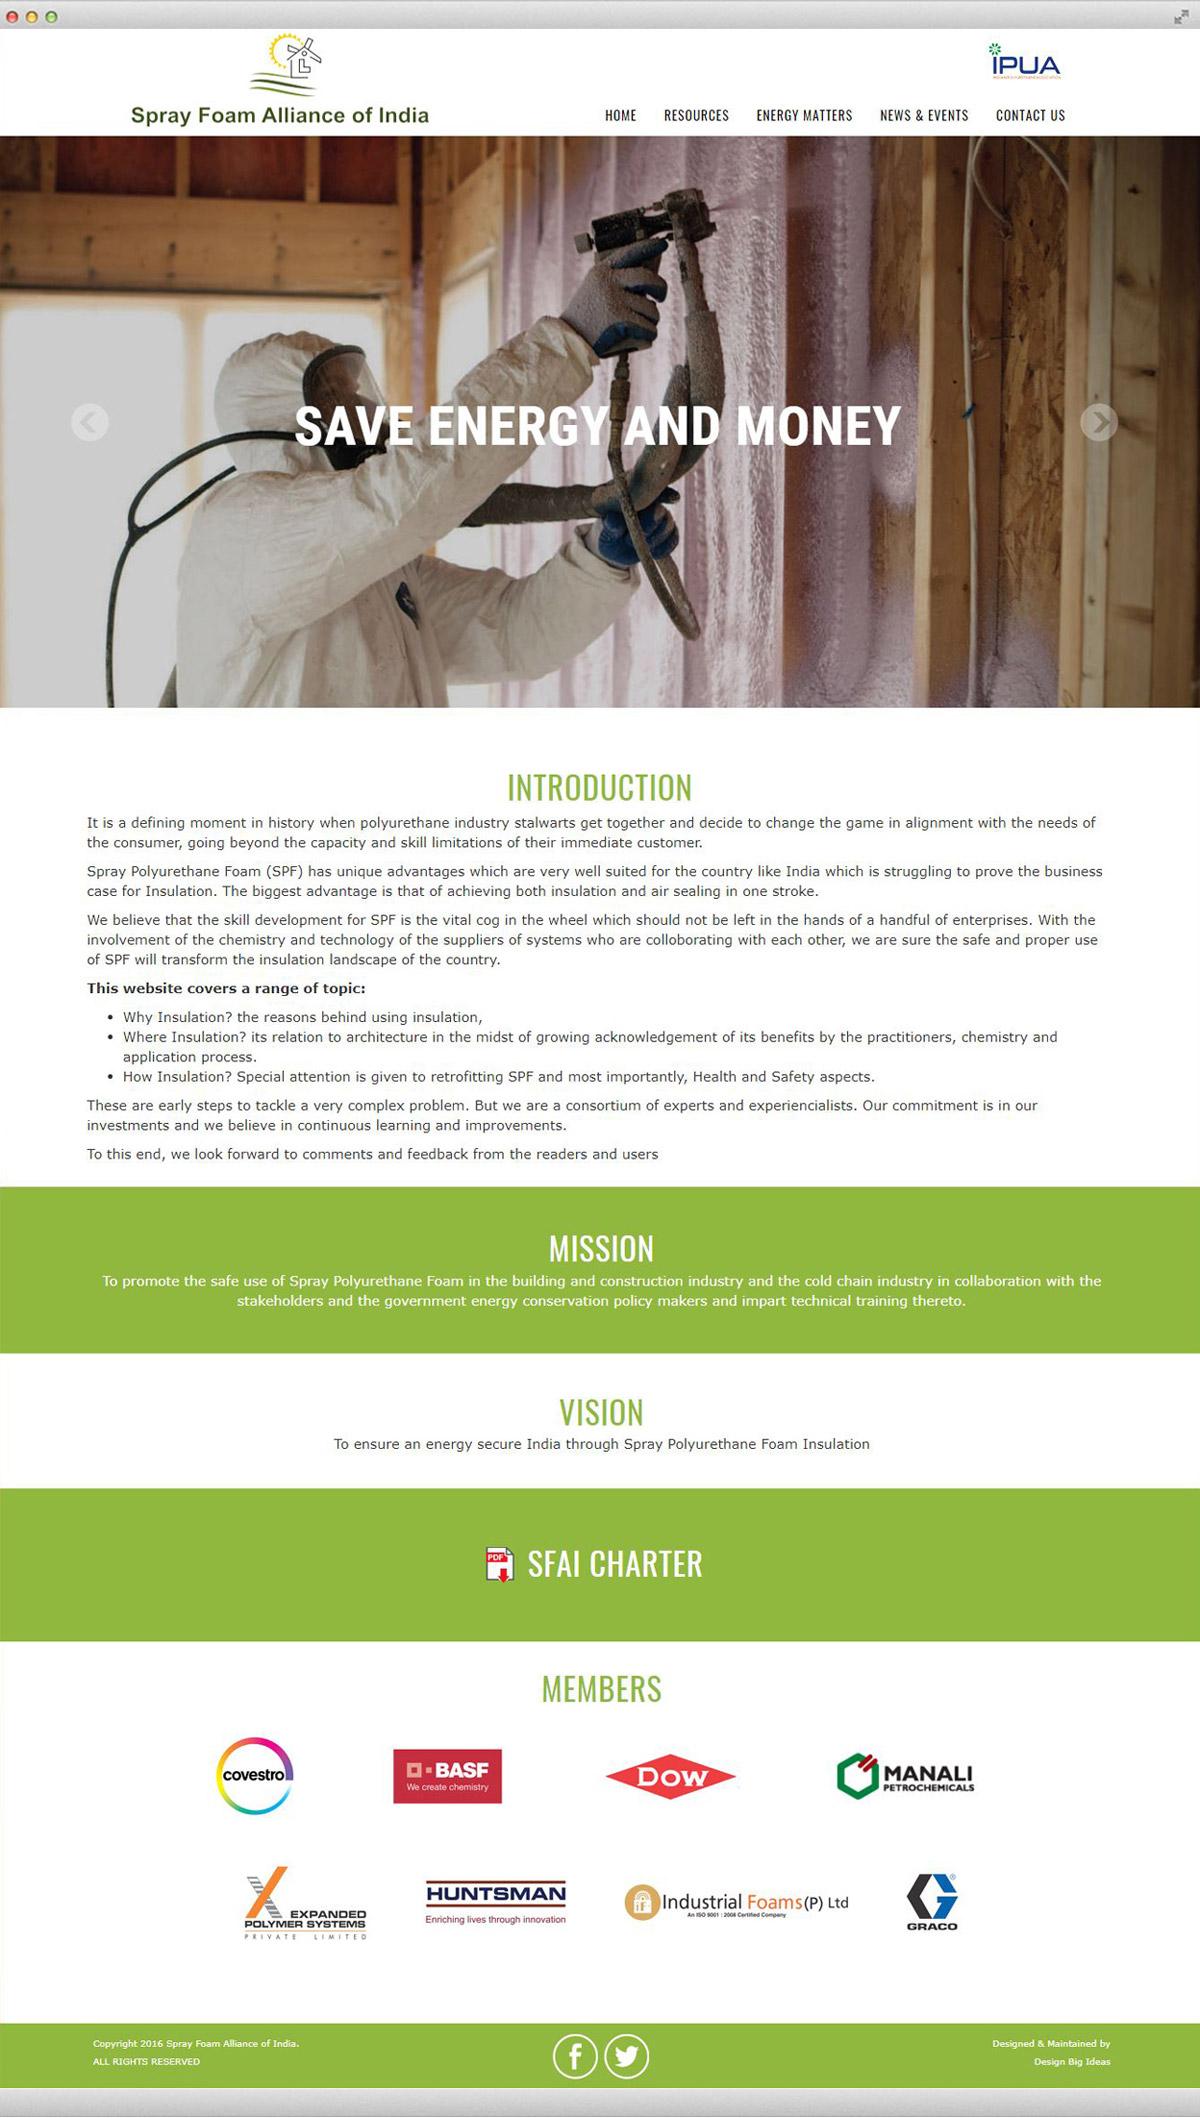 Website Design for Spray Foam Alliance of India